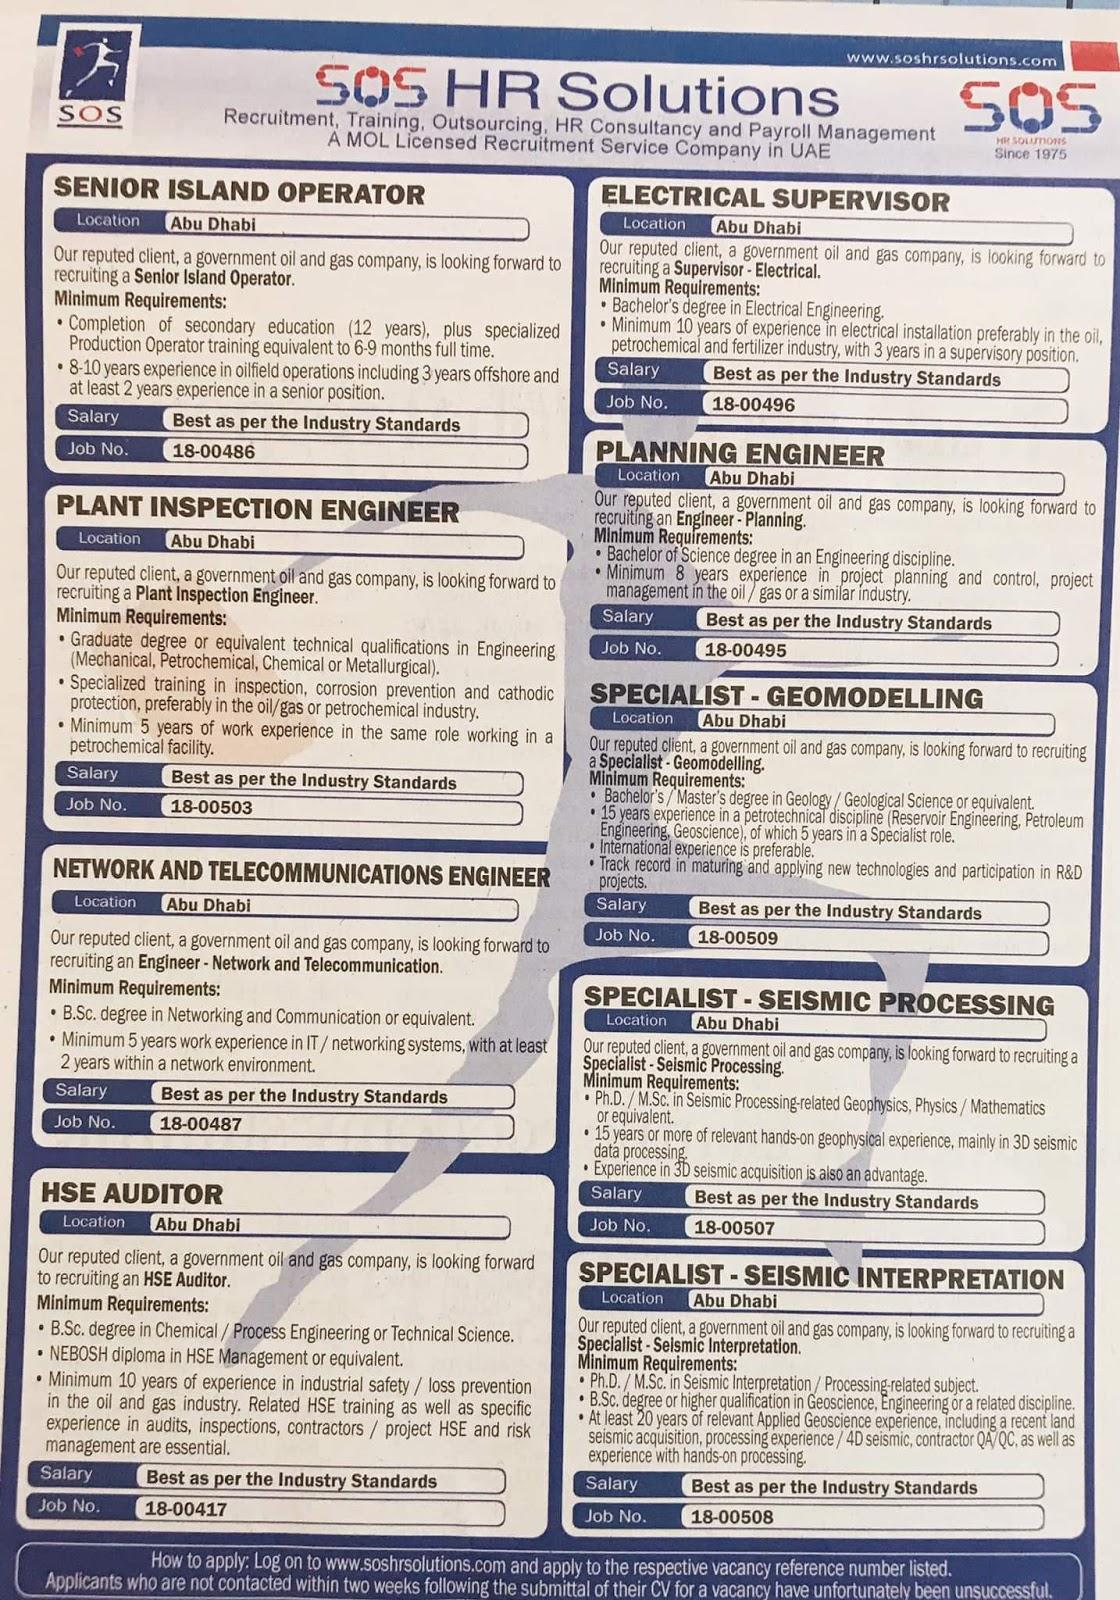 Required SOS HR Solution in UAE Local Hiring Jobs Khaleej